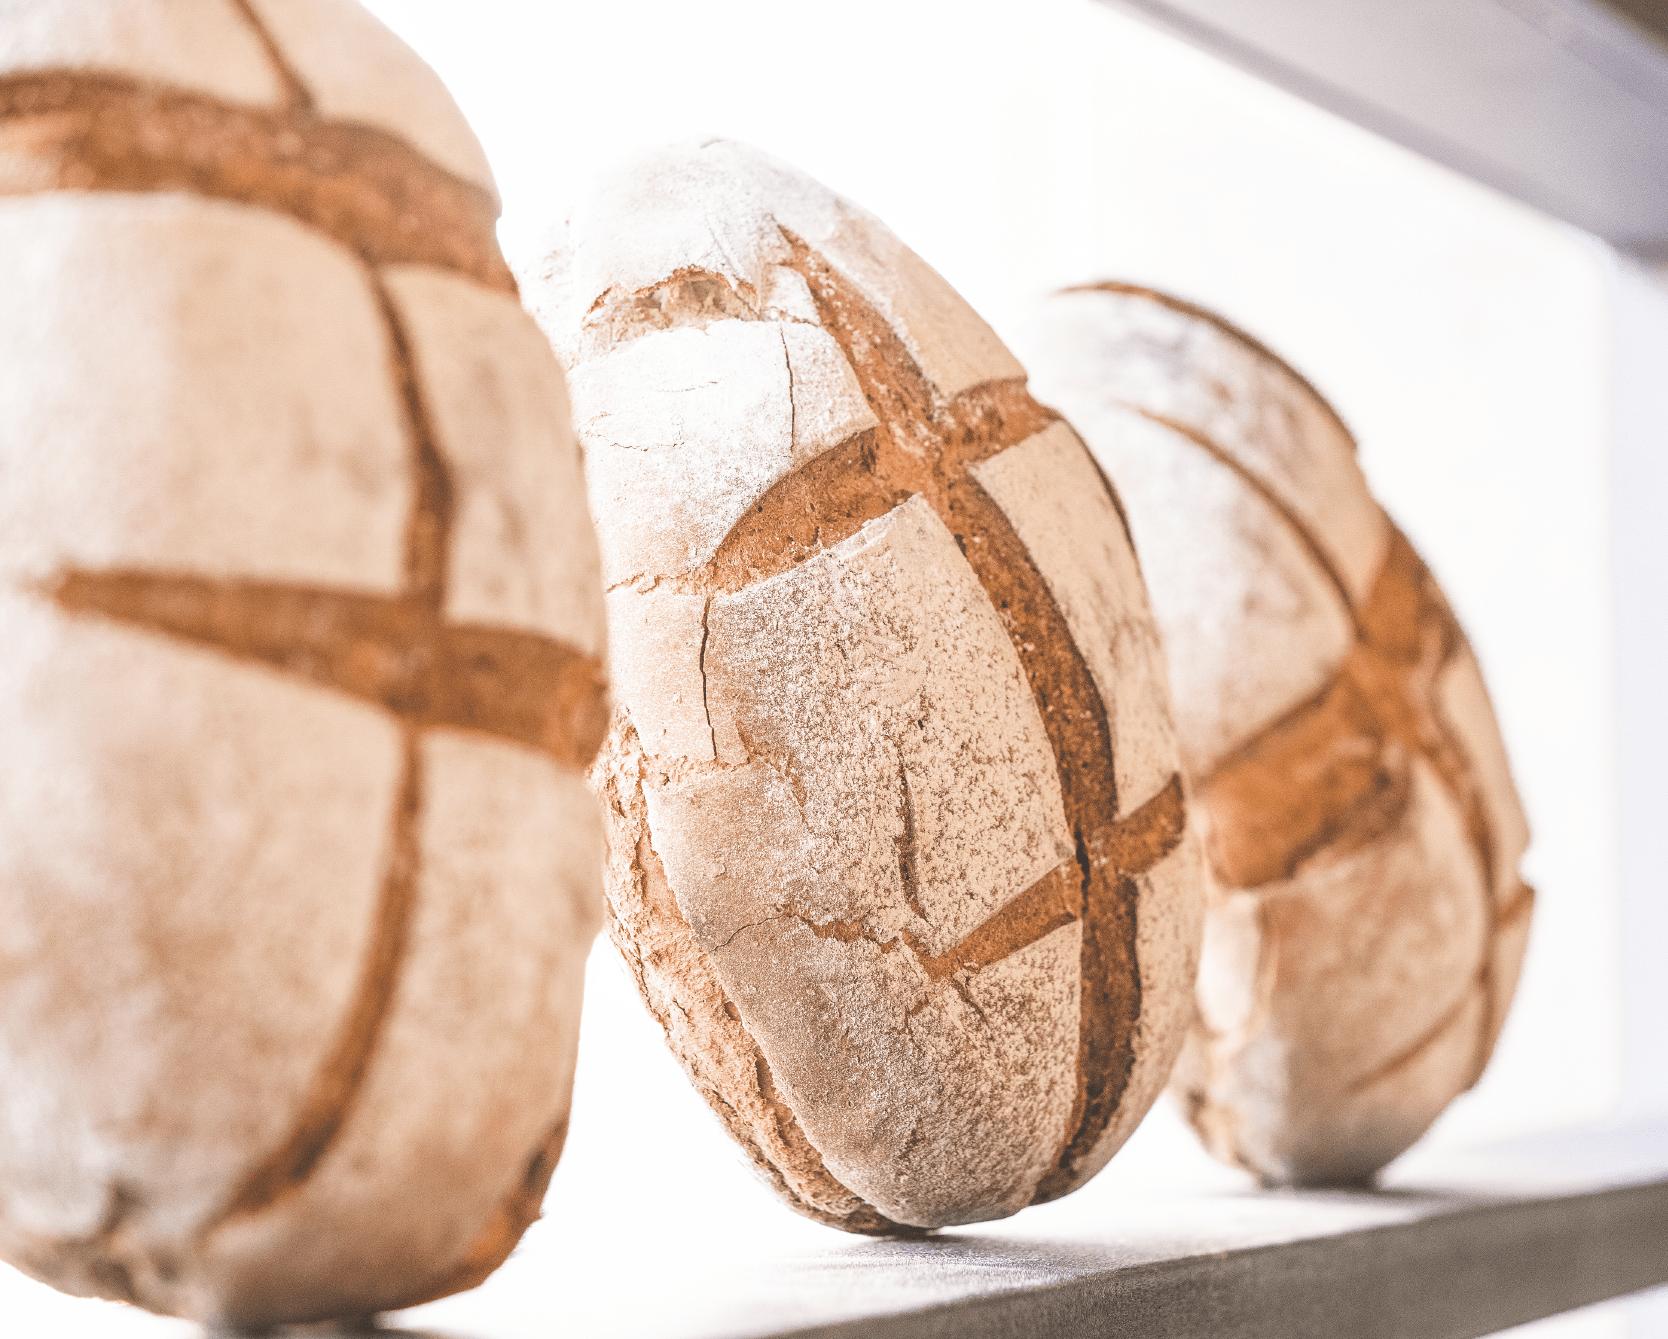 pao-padaria-pastelaria-entrega-casa-cale-confeitaria-tradicional-portuguesa-peniche-caldas-rainha-padaria-pastelaria